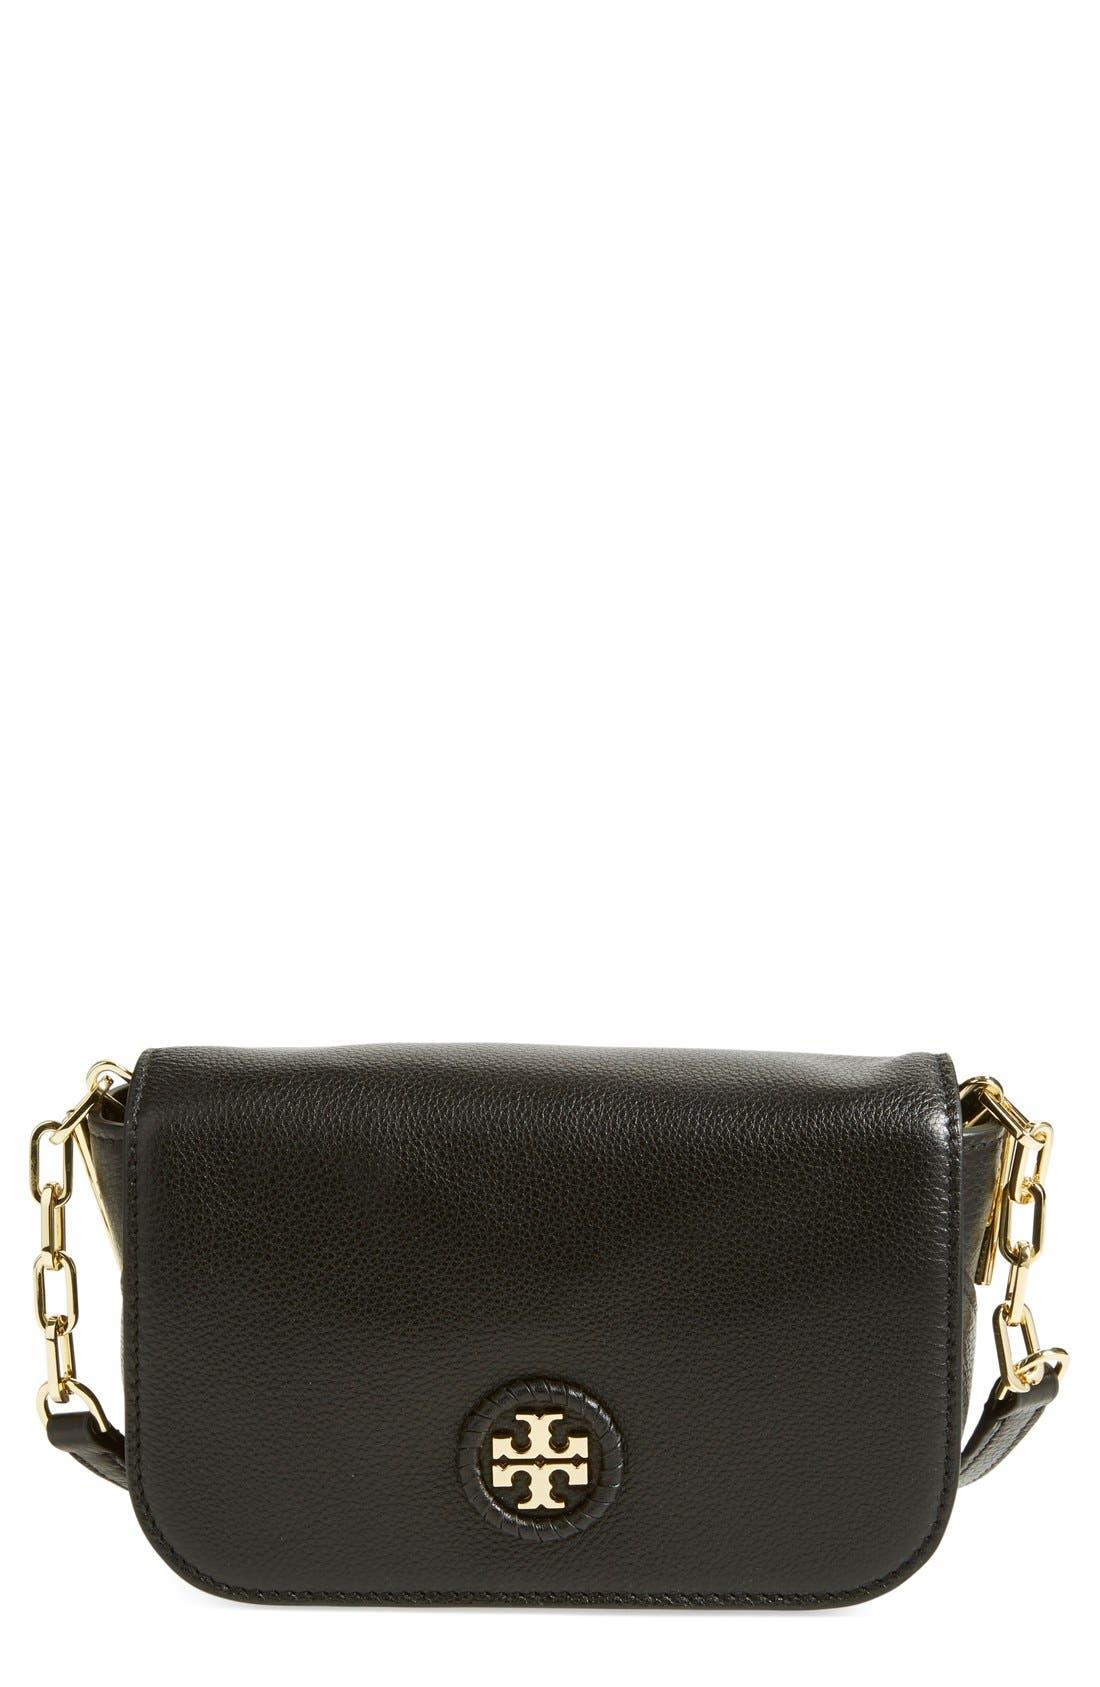 TORY BURCH, Mini Leather Crossbody Bag, Main thumbnail 1, color, 001